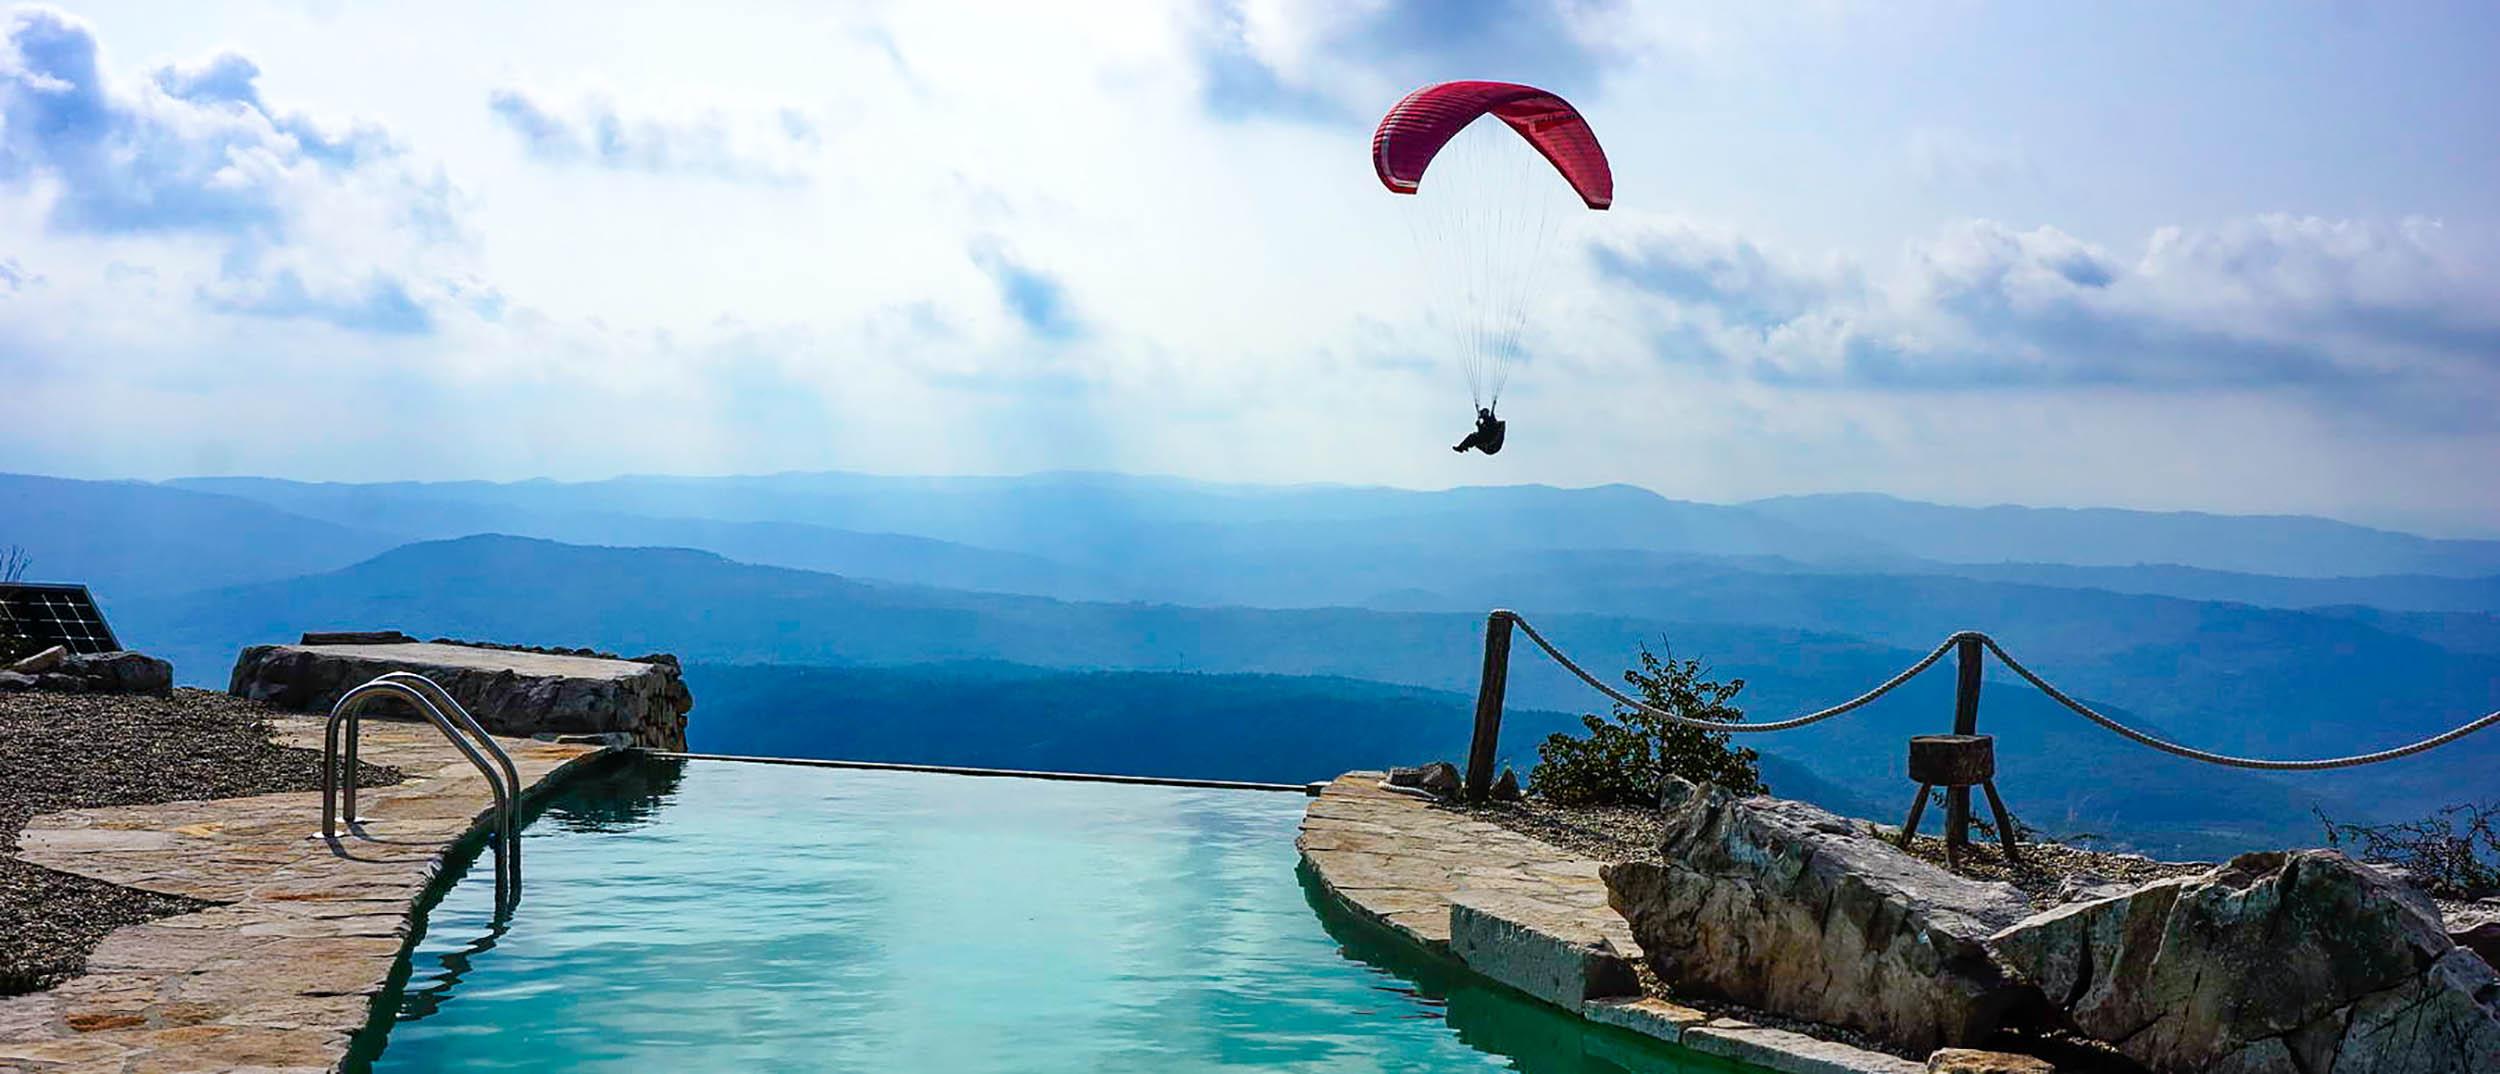 Gleitschirmreise Kroatien 2019 1.jpg